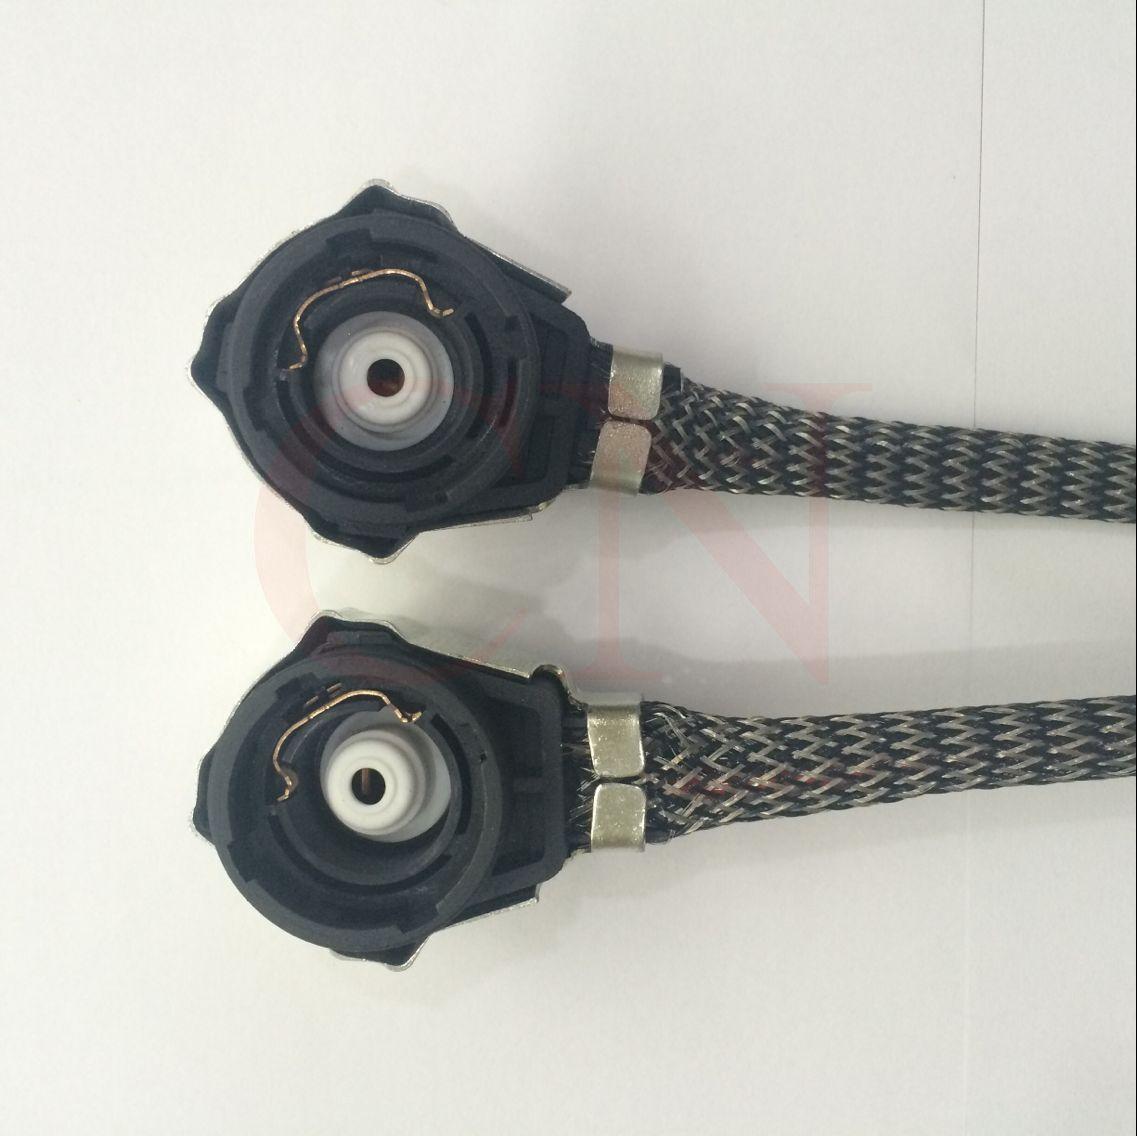 Alta Calidad 2 UNIDS D2S D2C C2R Xenon SOCKET para HID Bombilla Socket Wire Plug Adaptador de Cable Convertidor Conectores